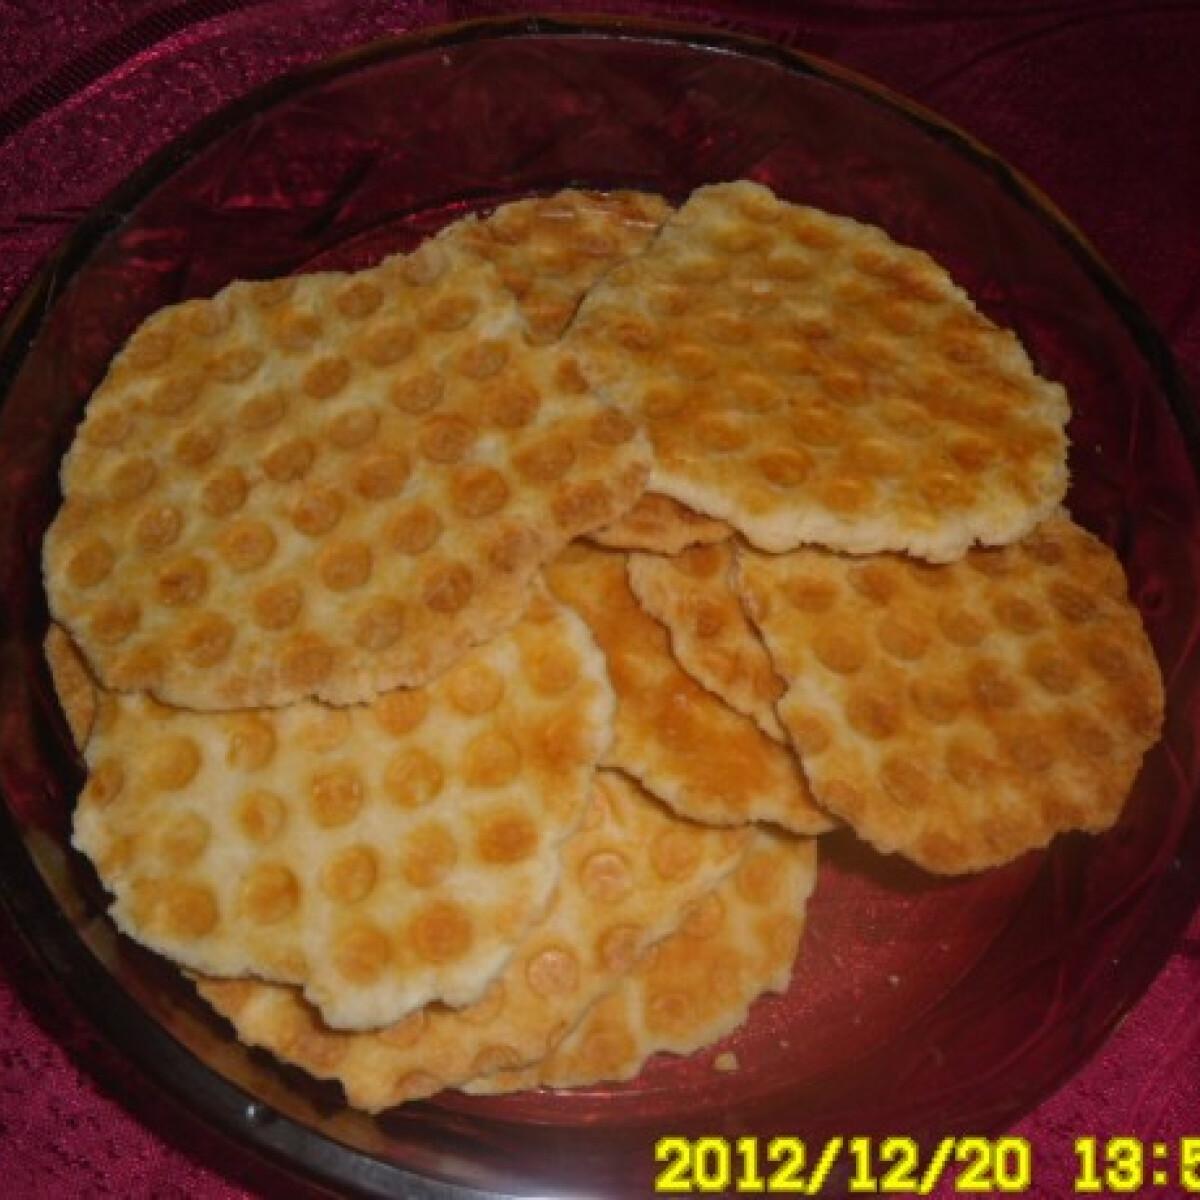 Ezen a képen: Sós ropogós Kisvikica konyhájából